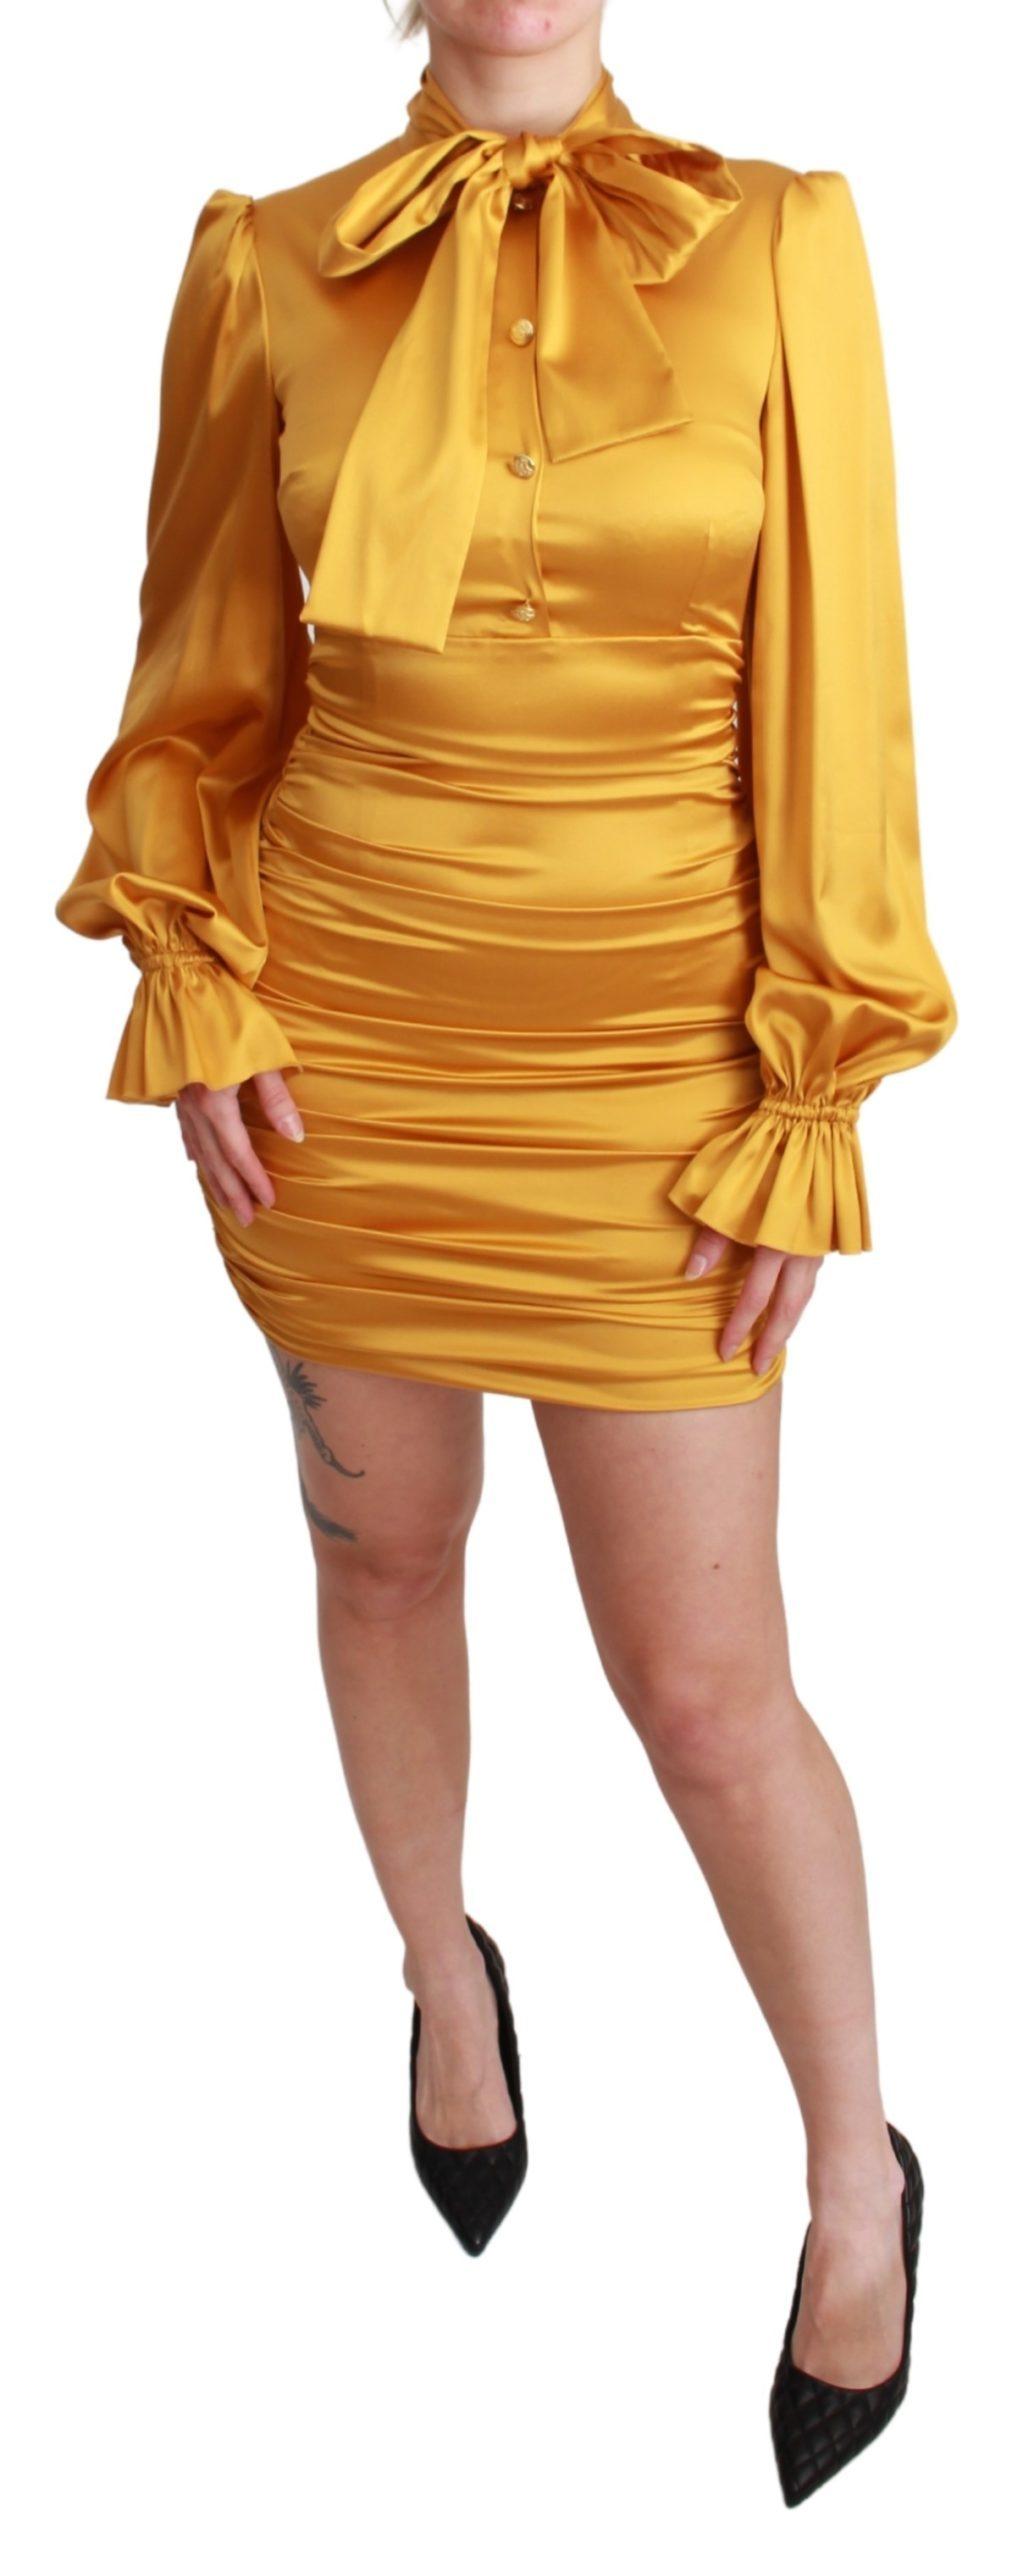 Dolce & Gabbana Women's Silk Stretch Sheath Bodycon Mini Dress Yellow DR2555 - IT40|S